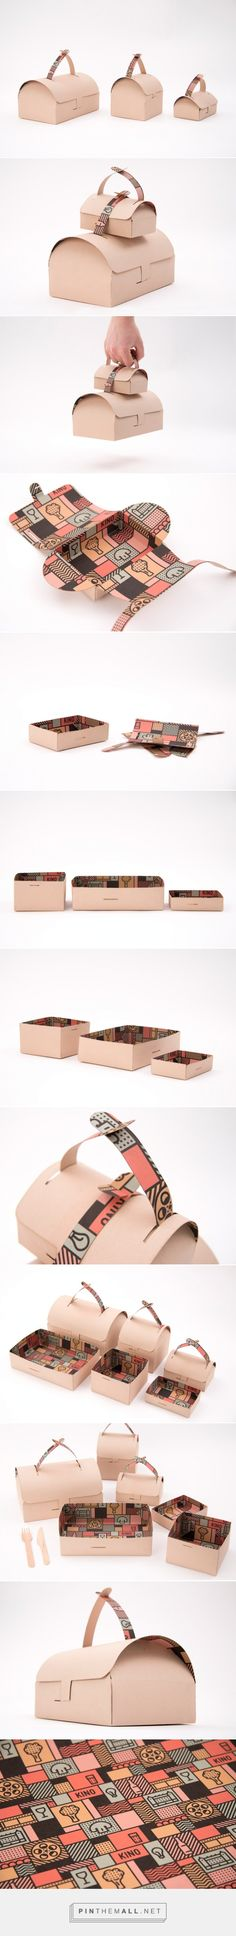 Kino Take Away #concept #packaging designed by Gustav Karlsson - http://www.packagingoftheworld.com/2015/04/kino-take-away-concept.html